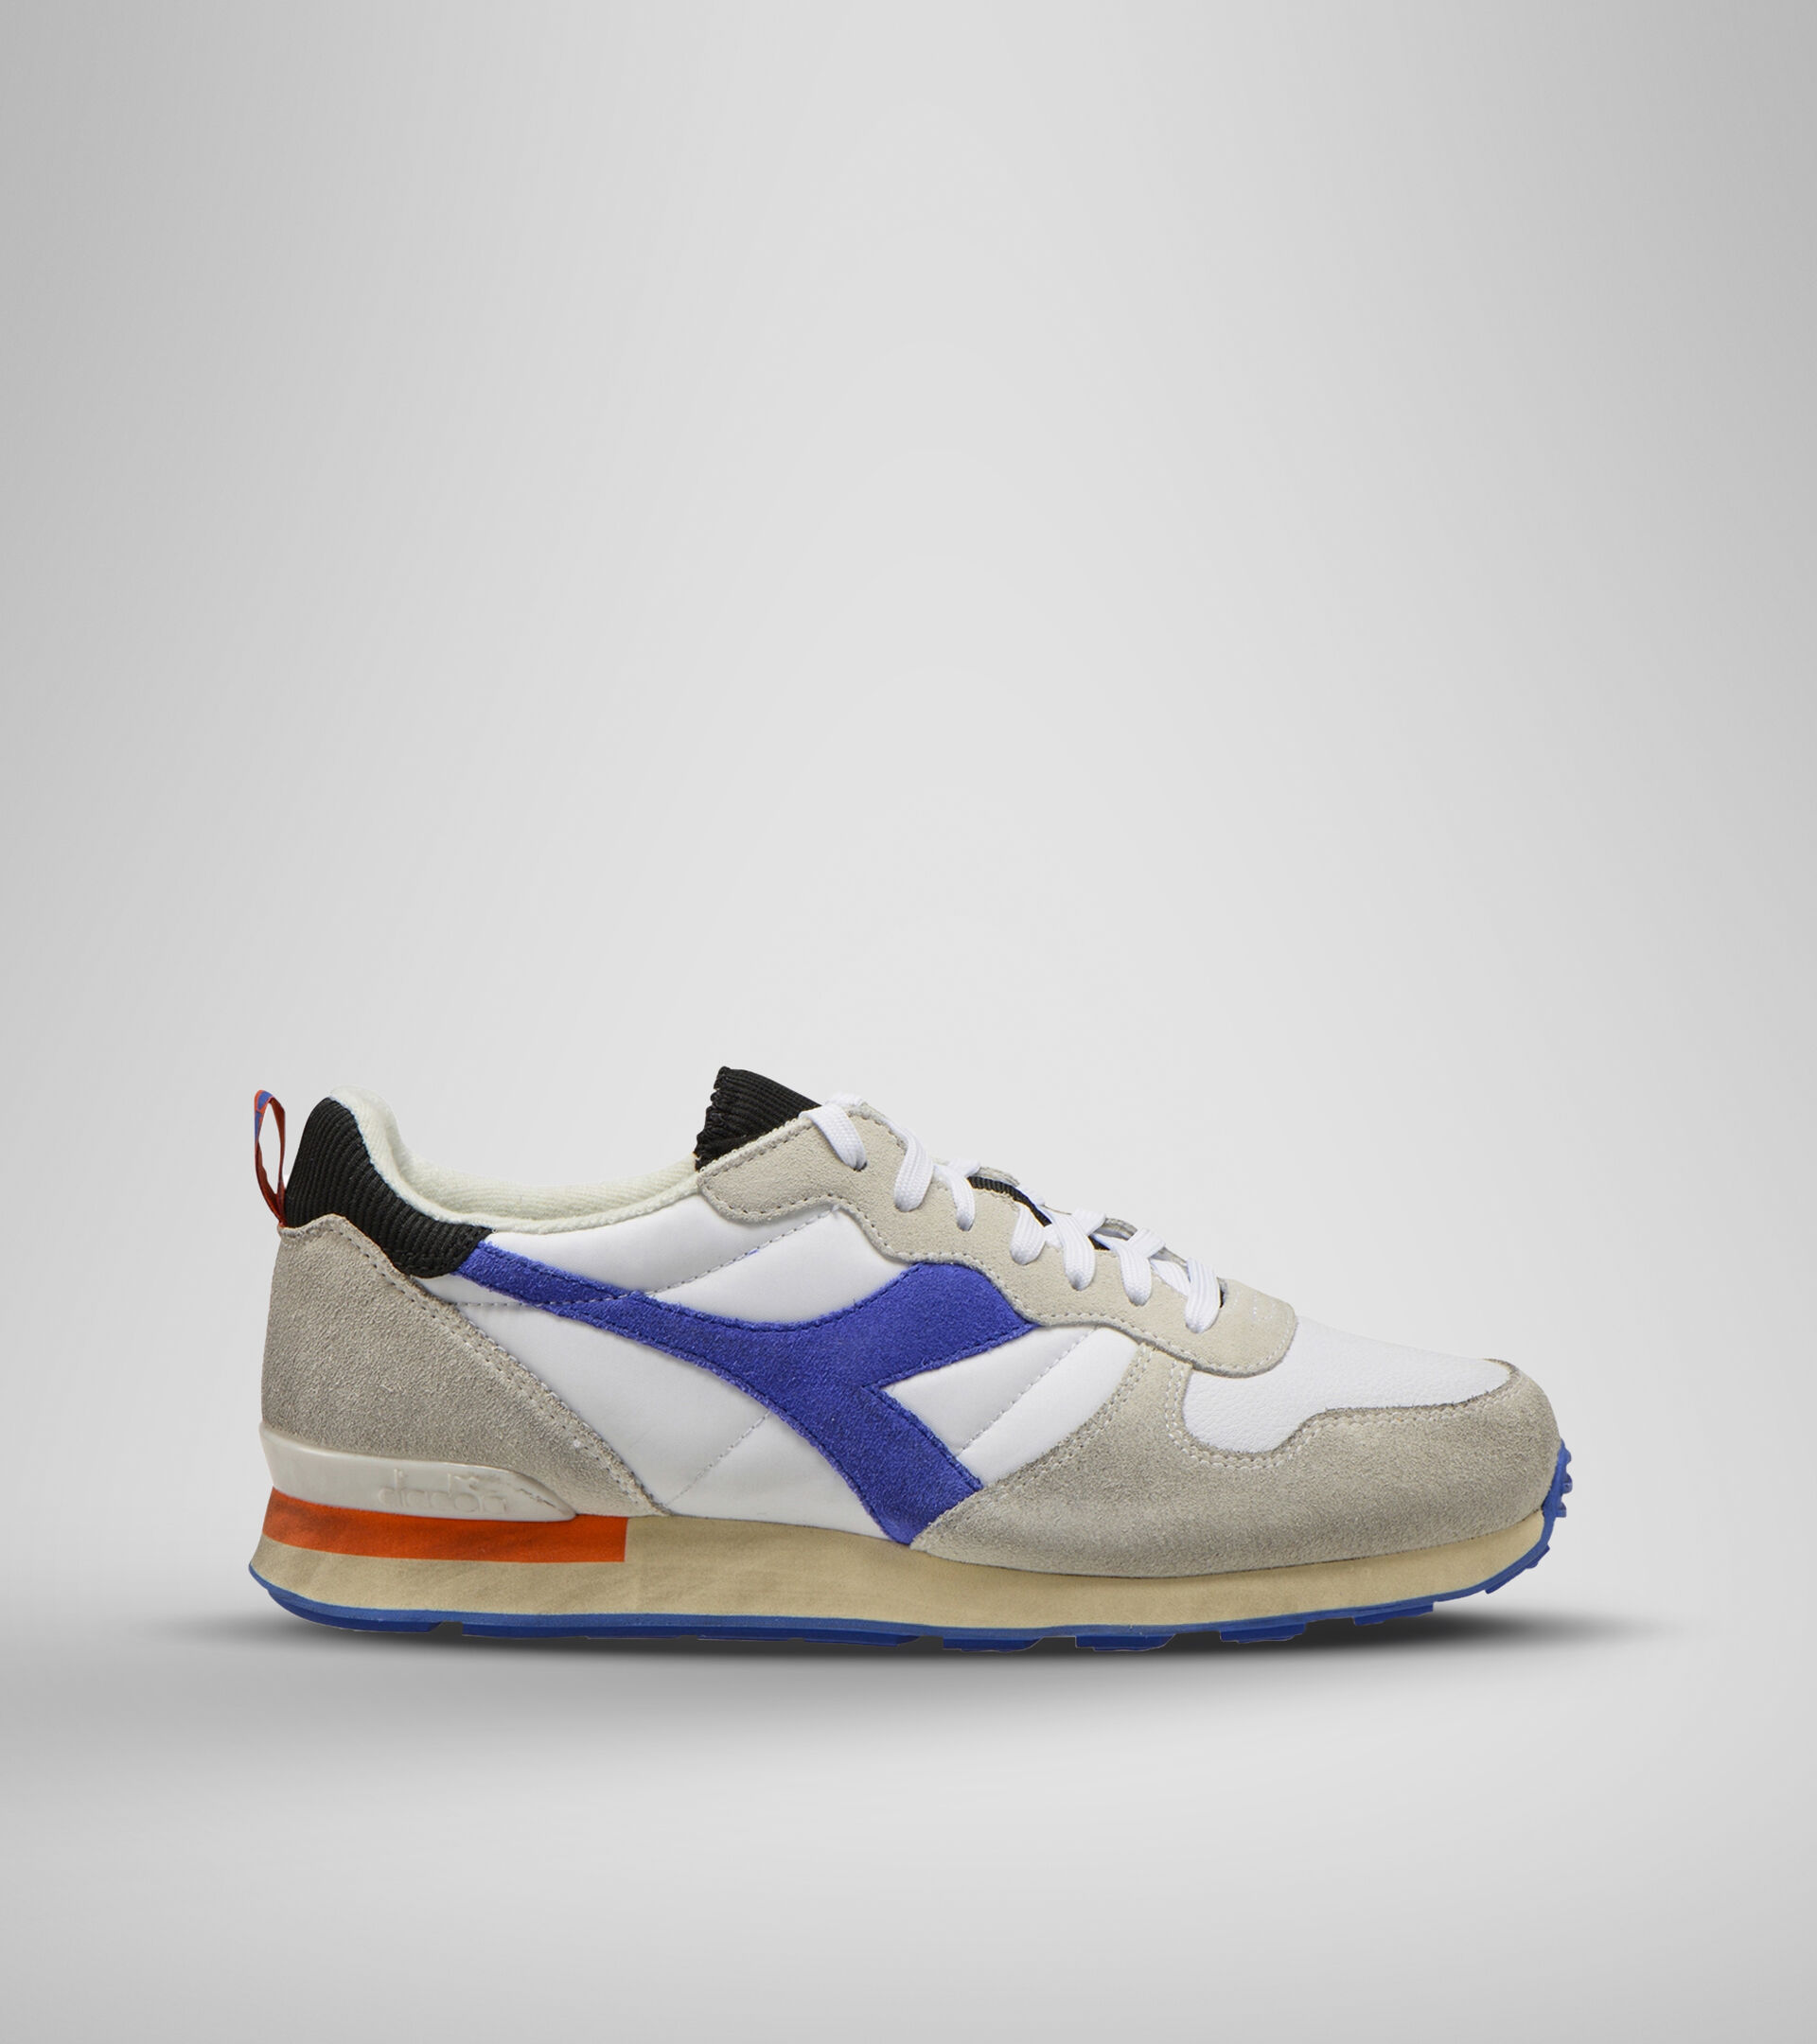 Footwear Sportswear UNISEX CAMARO ICONA WHITE/AMPARO BLUE/ORANGEADE Diadora